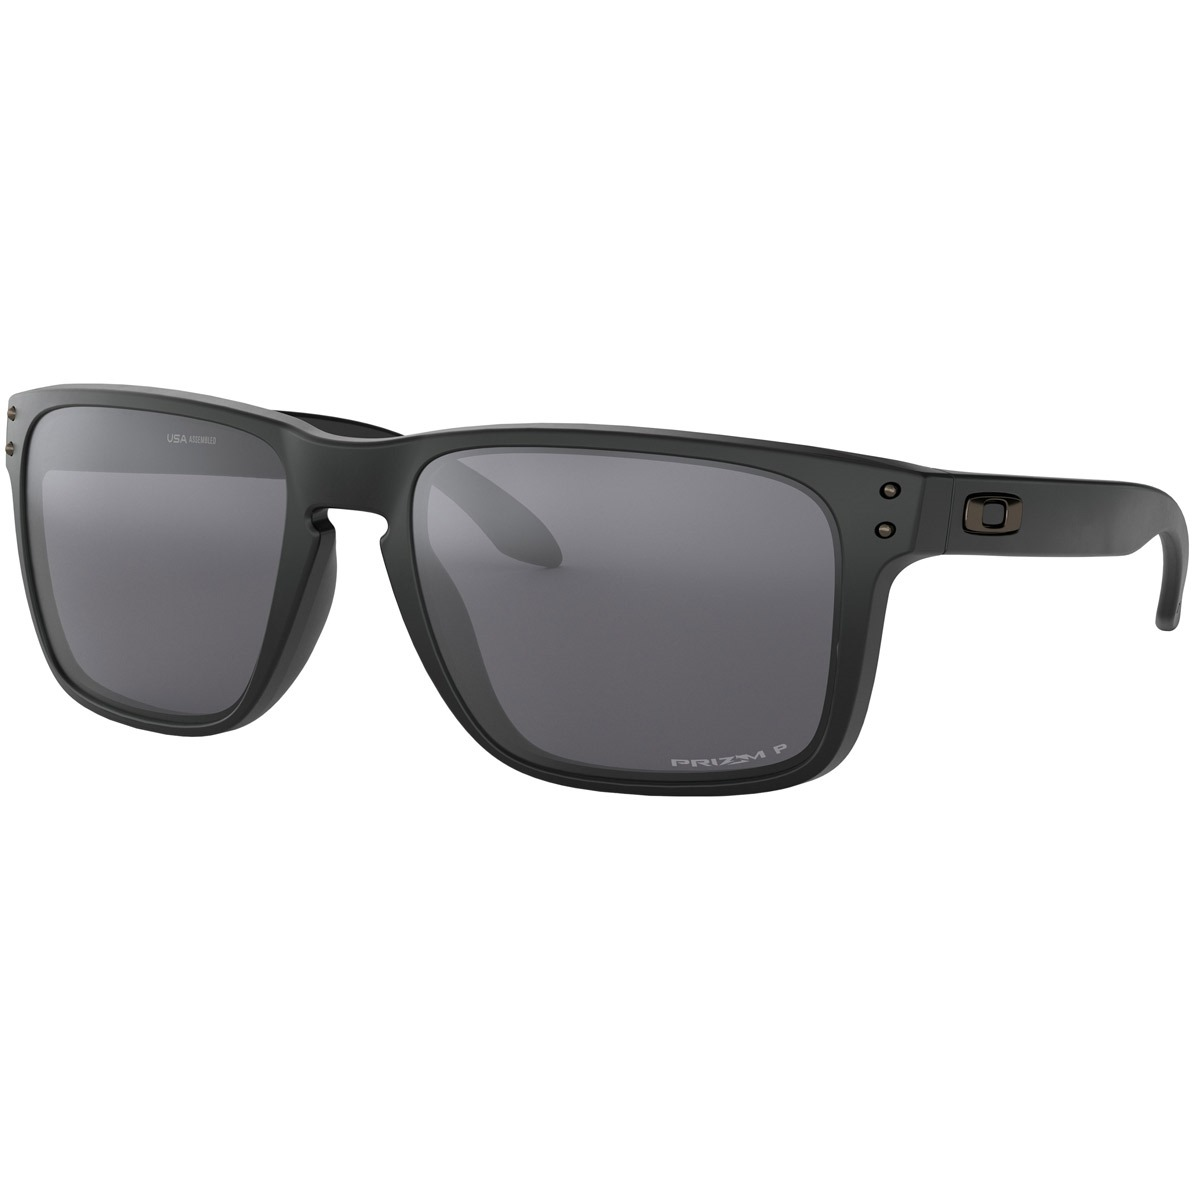 db6489dcbd880 Óculos Oakley Holbrook Xl Matte Black prizm Black - Cut Wave - R ...